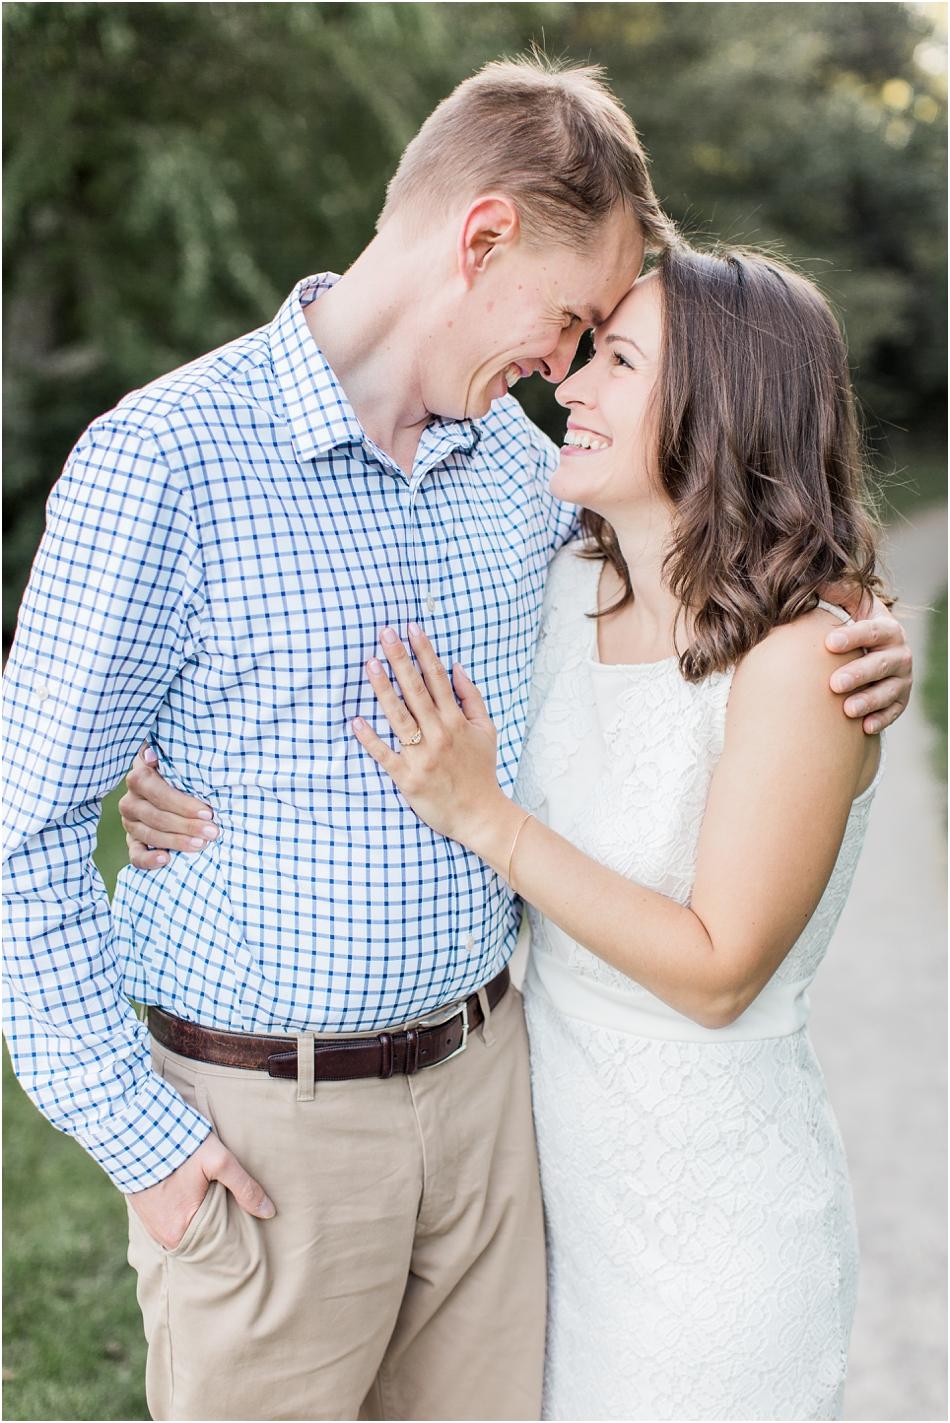 arnold_arboretum_engagement_dylan_mariana_cape_cod_boston_new_england_wedding_photographer_Meredith_Jane_Photography_photo_2670.jpg